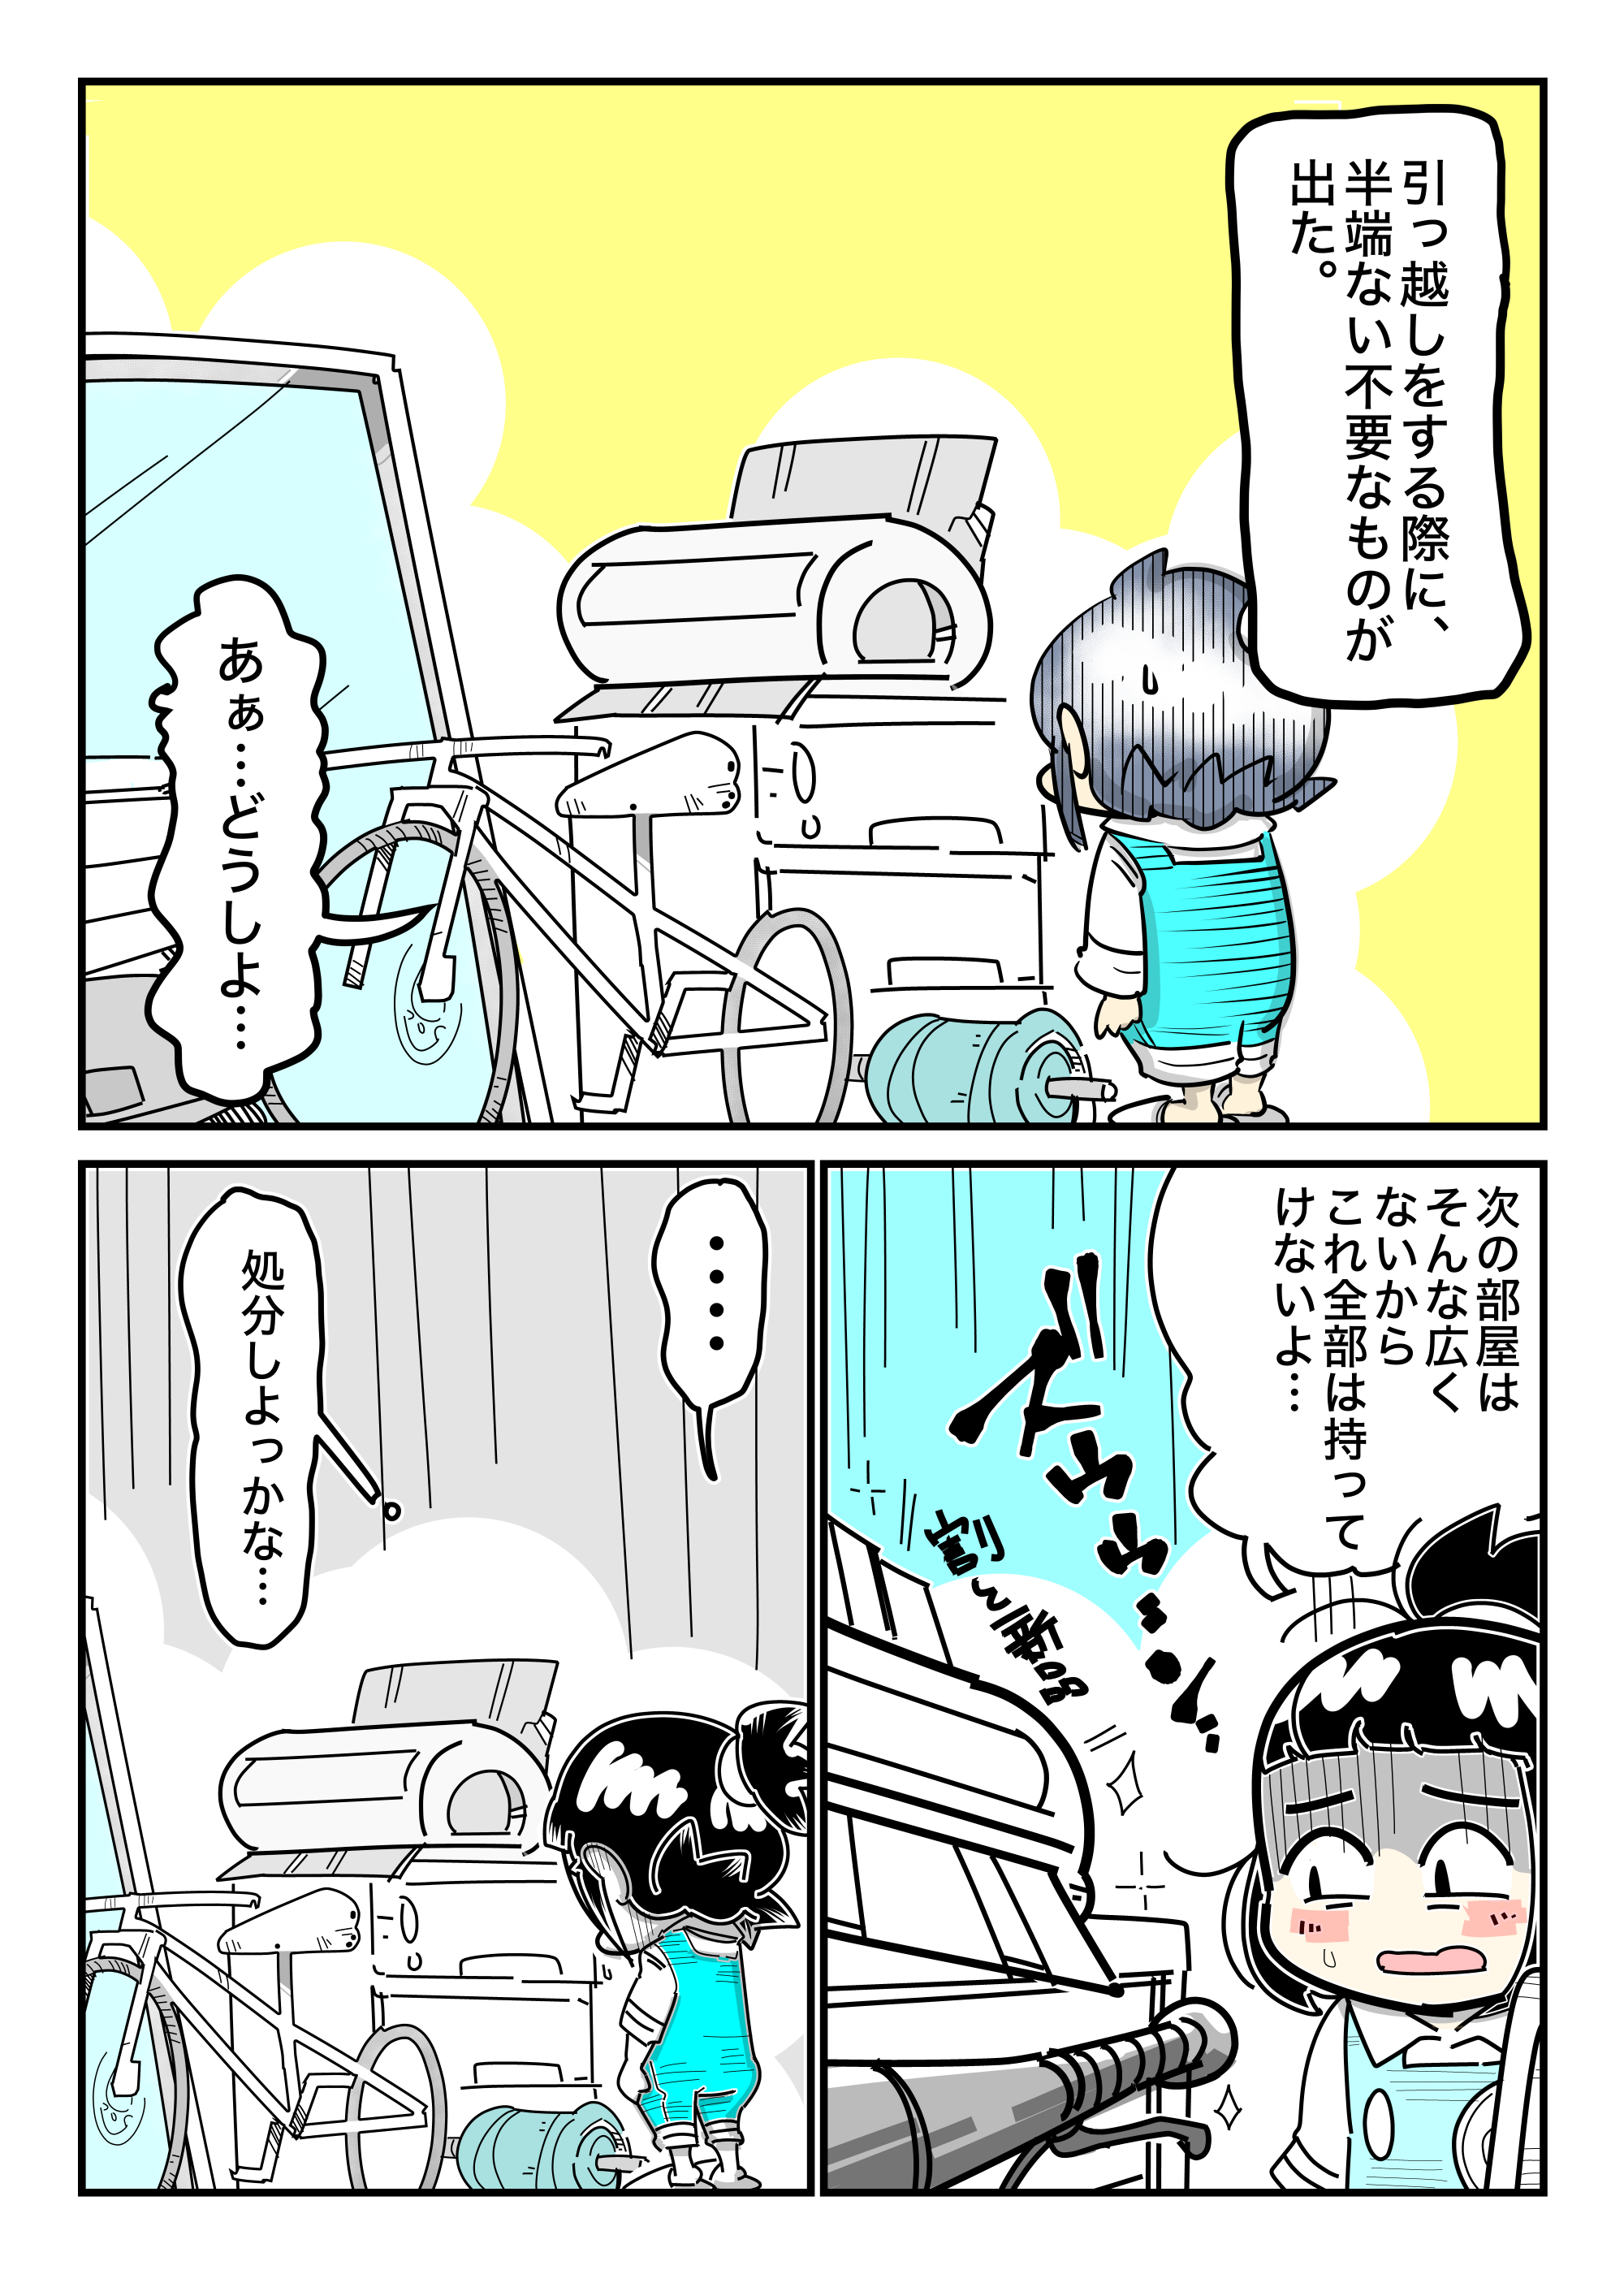 f:id:terashimaru117:20210910123341p:plain